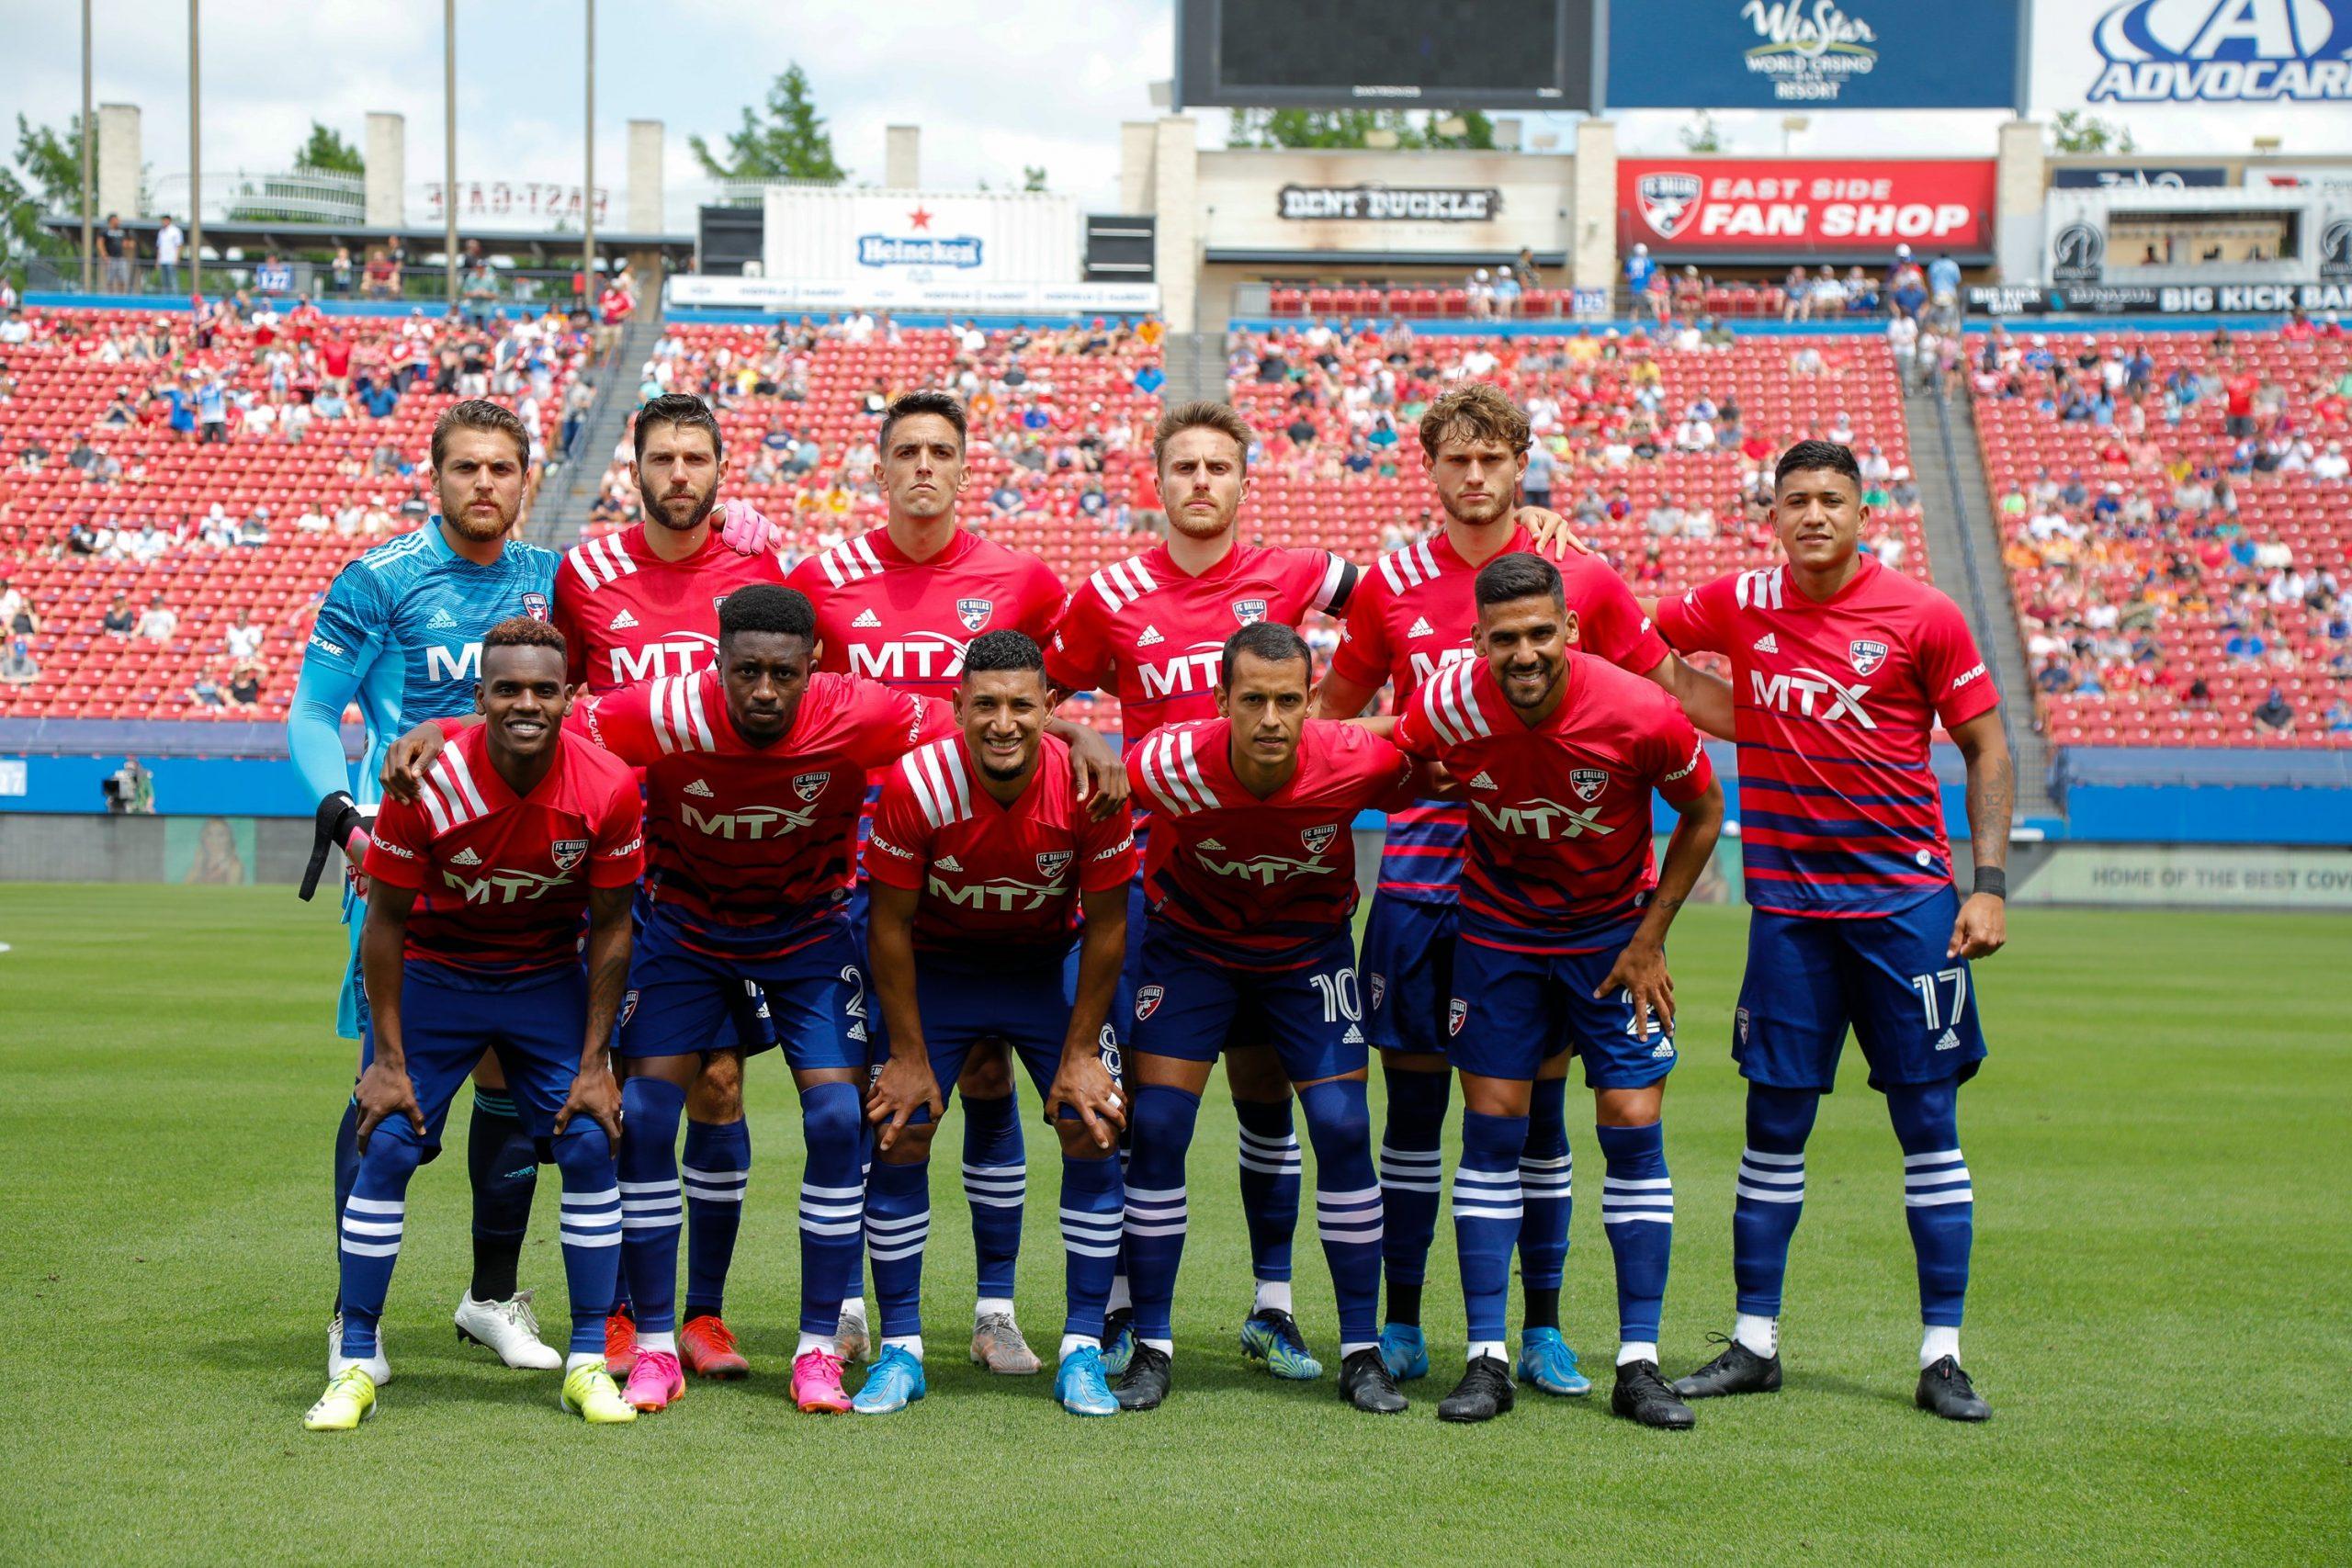 FC Dallas visita a Minnesota en la 5ta jornada de la MLS